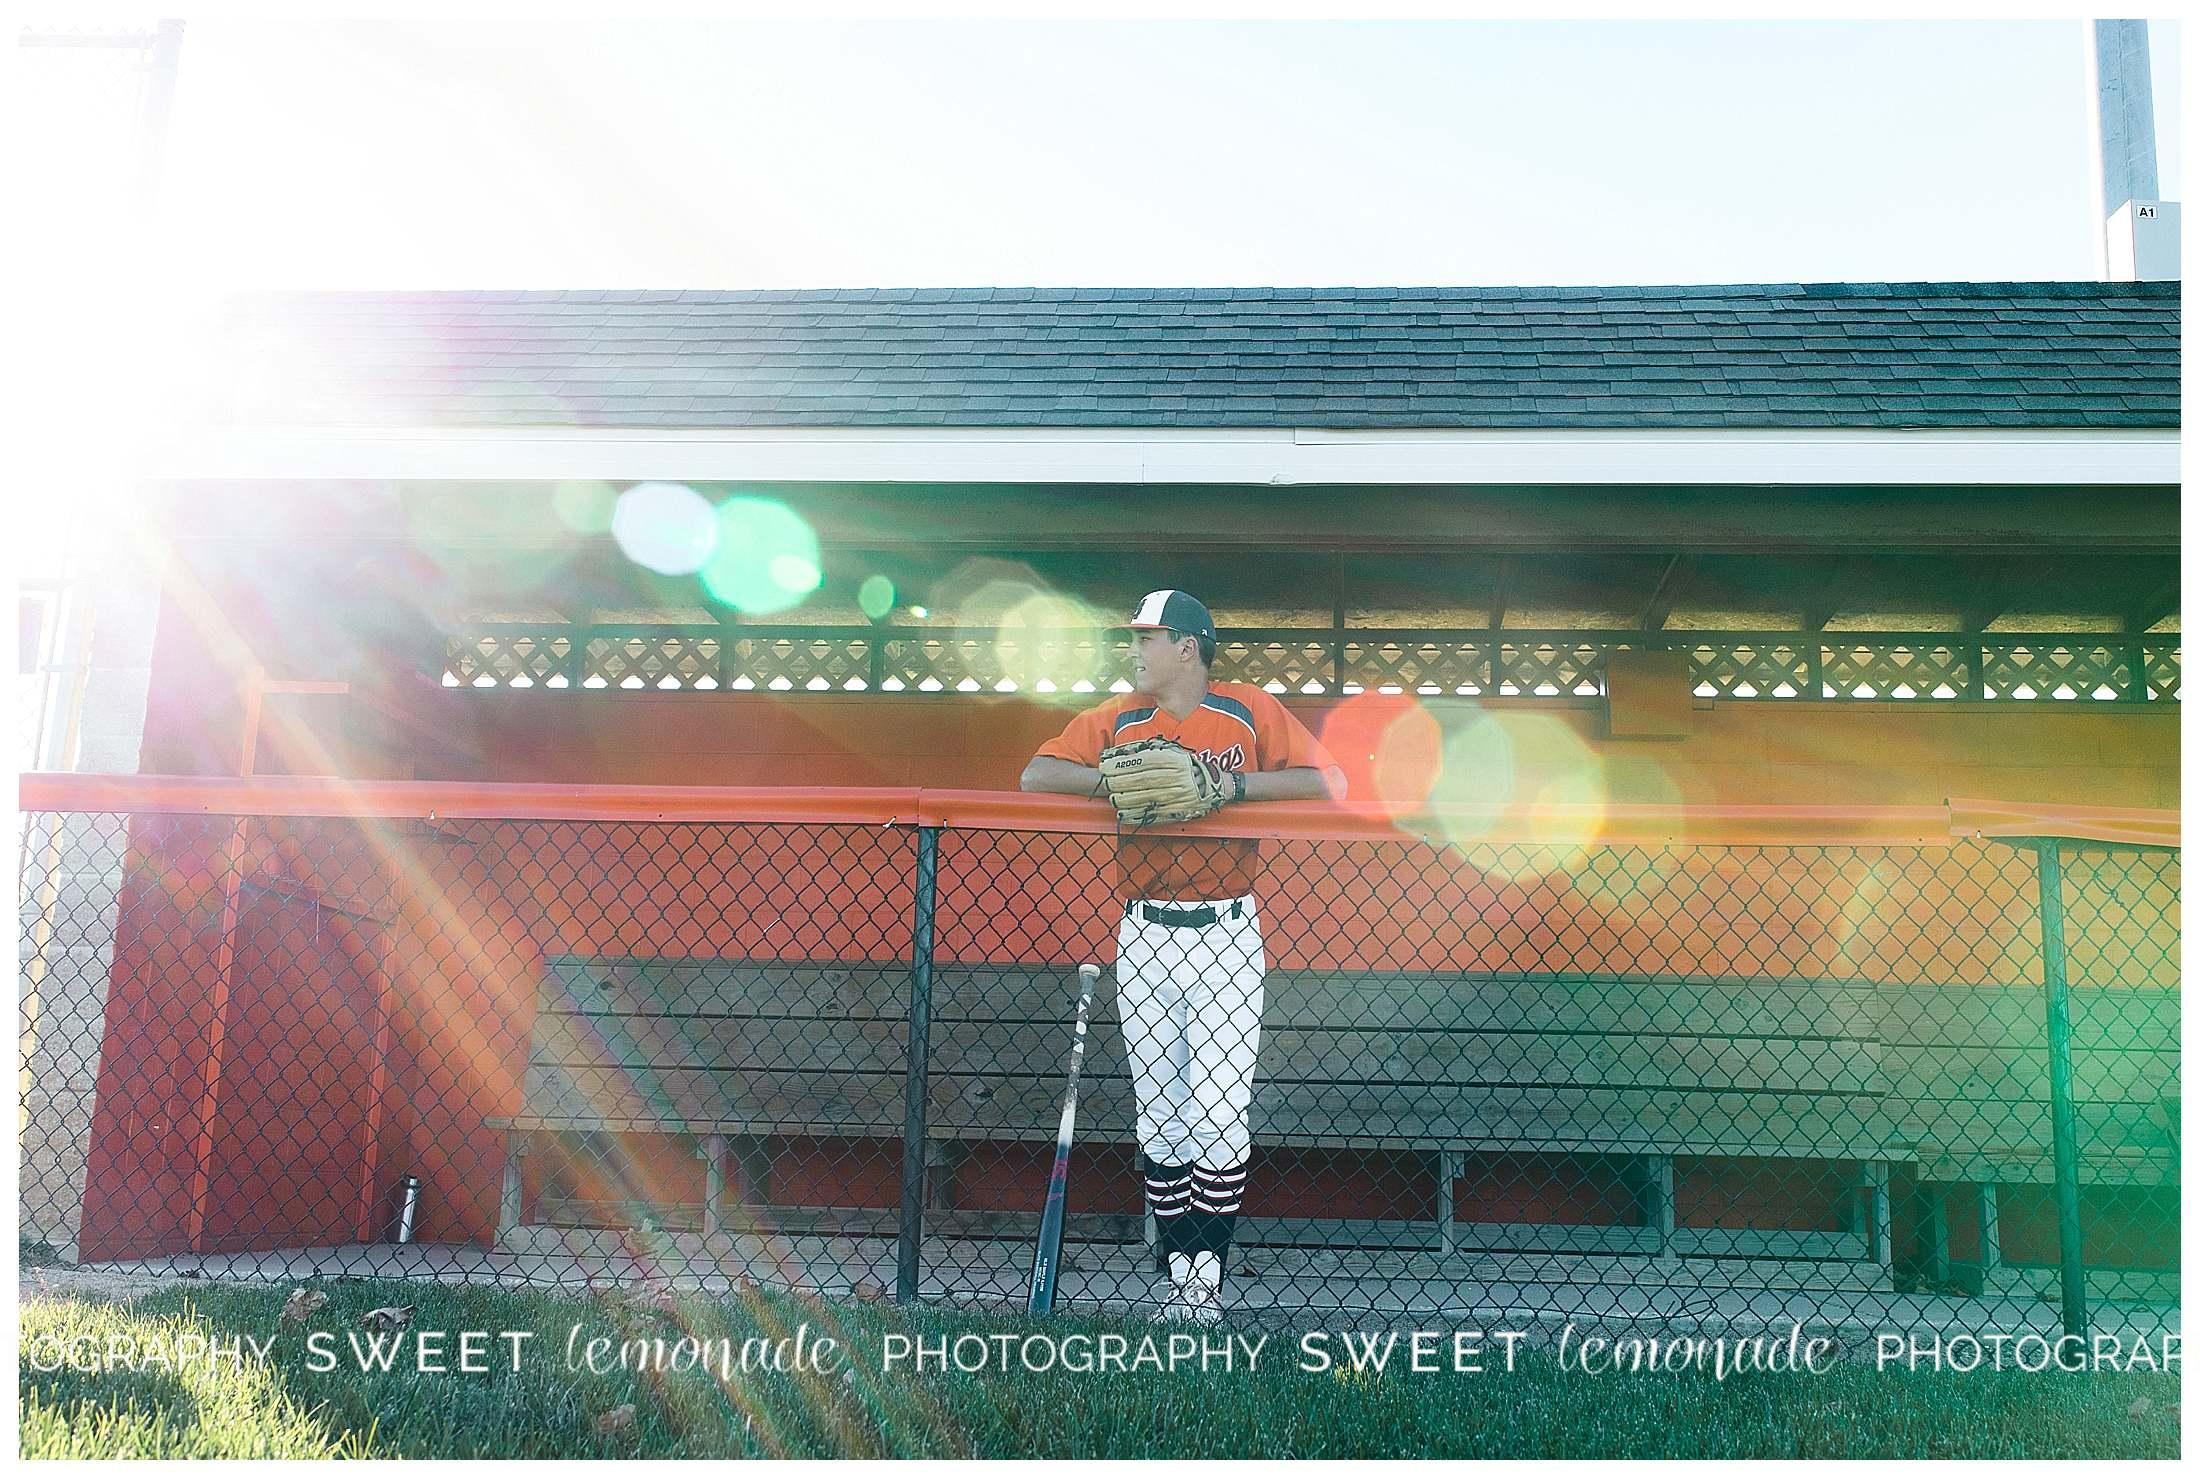 champaign-mahomet-illinois-senior-photographer-notre-dame-baseball-sweet-lemonade-photography_1775.jpg